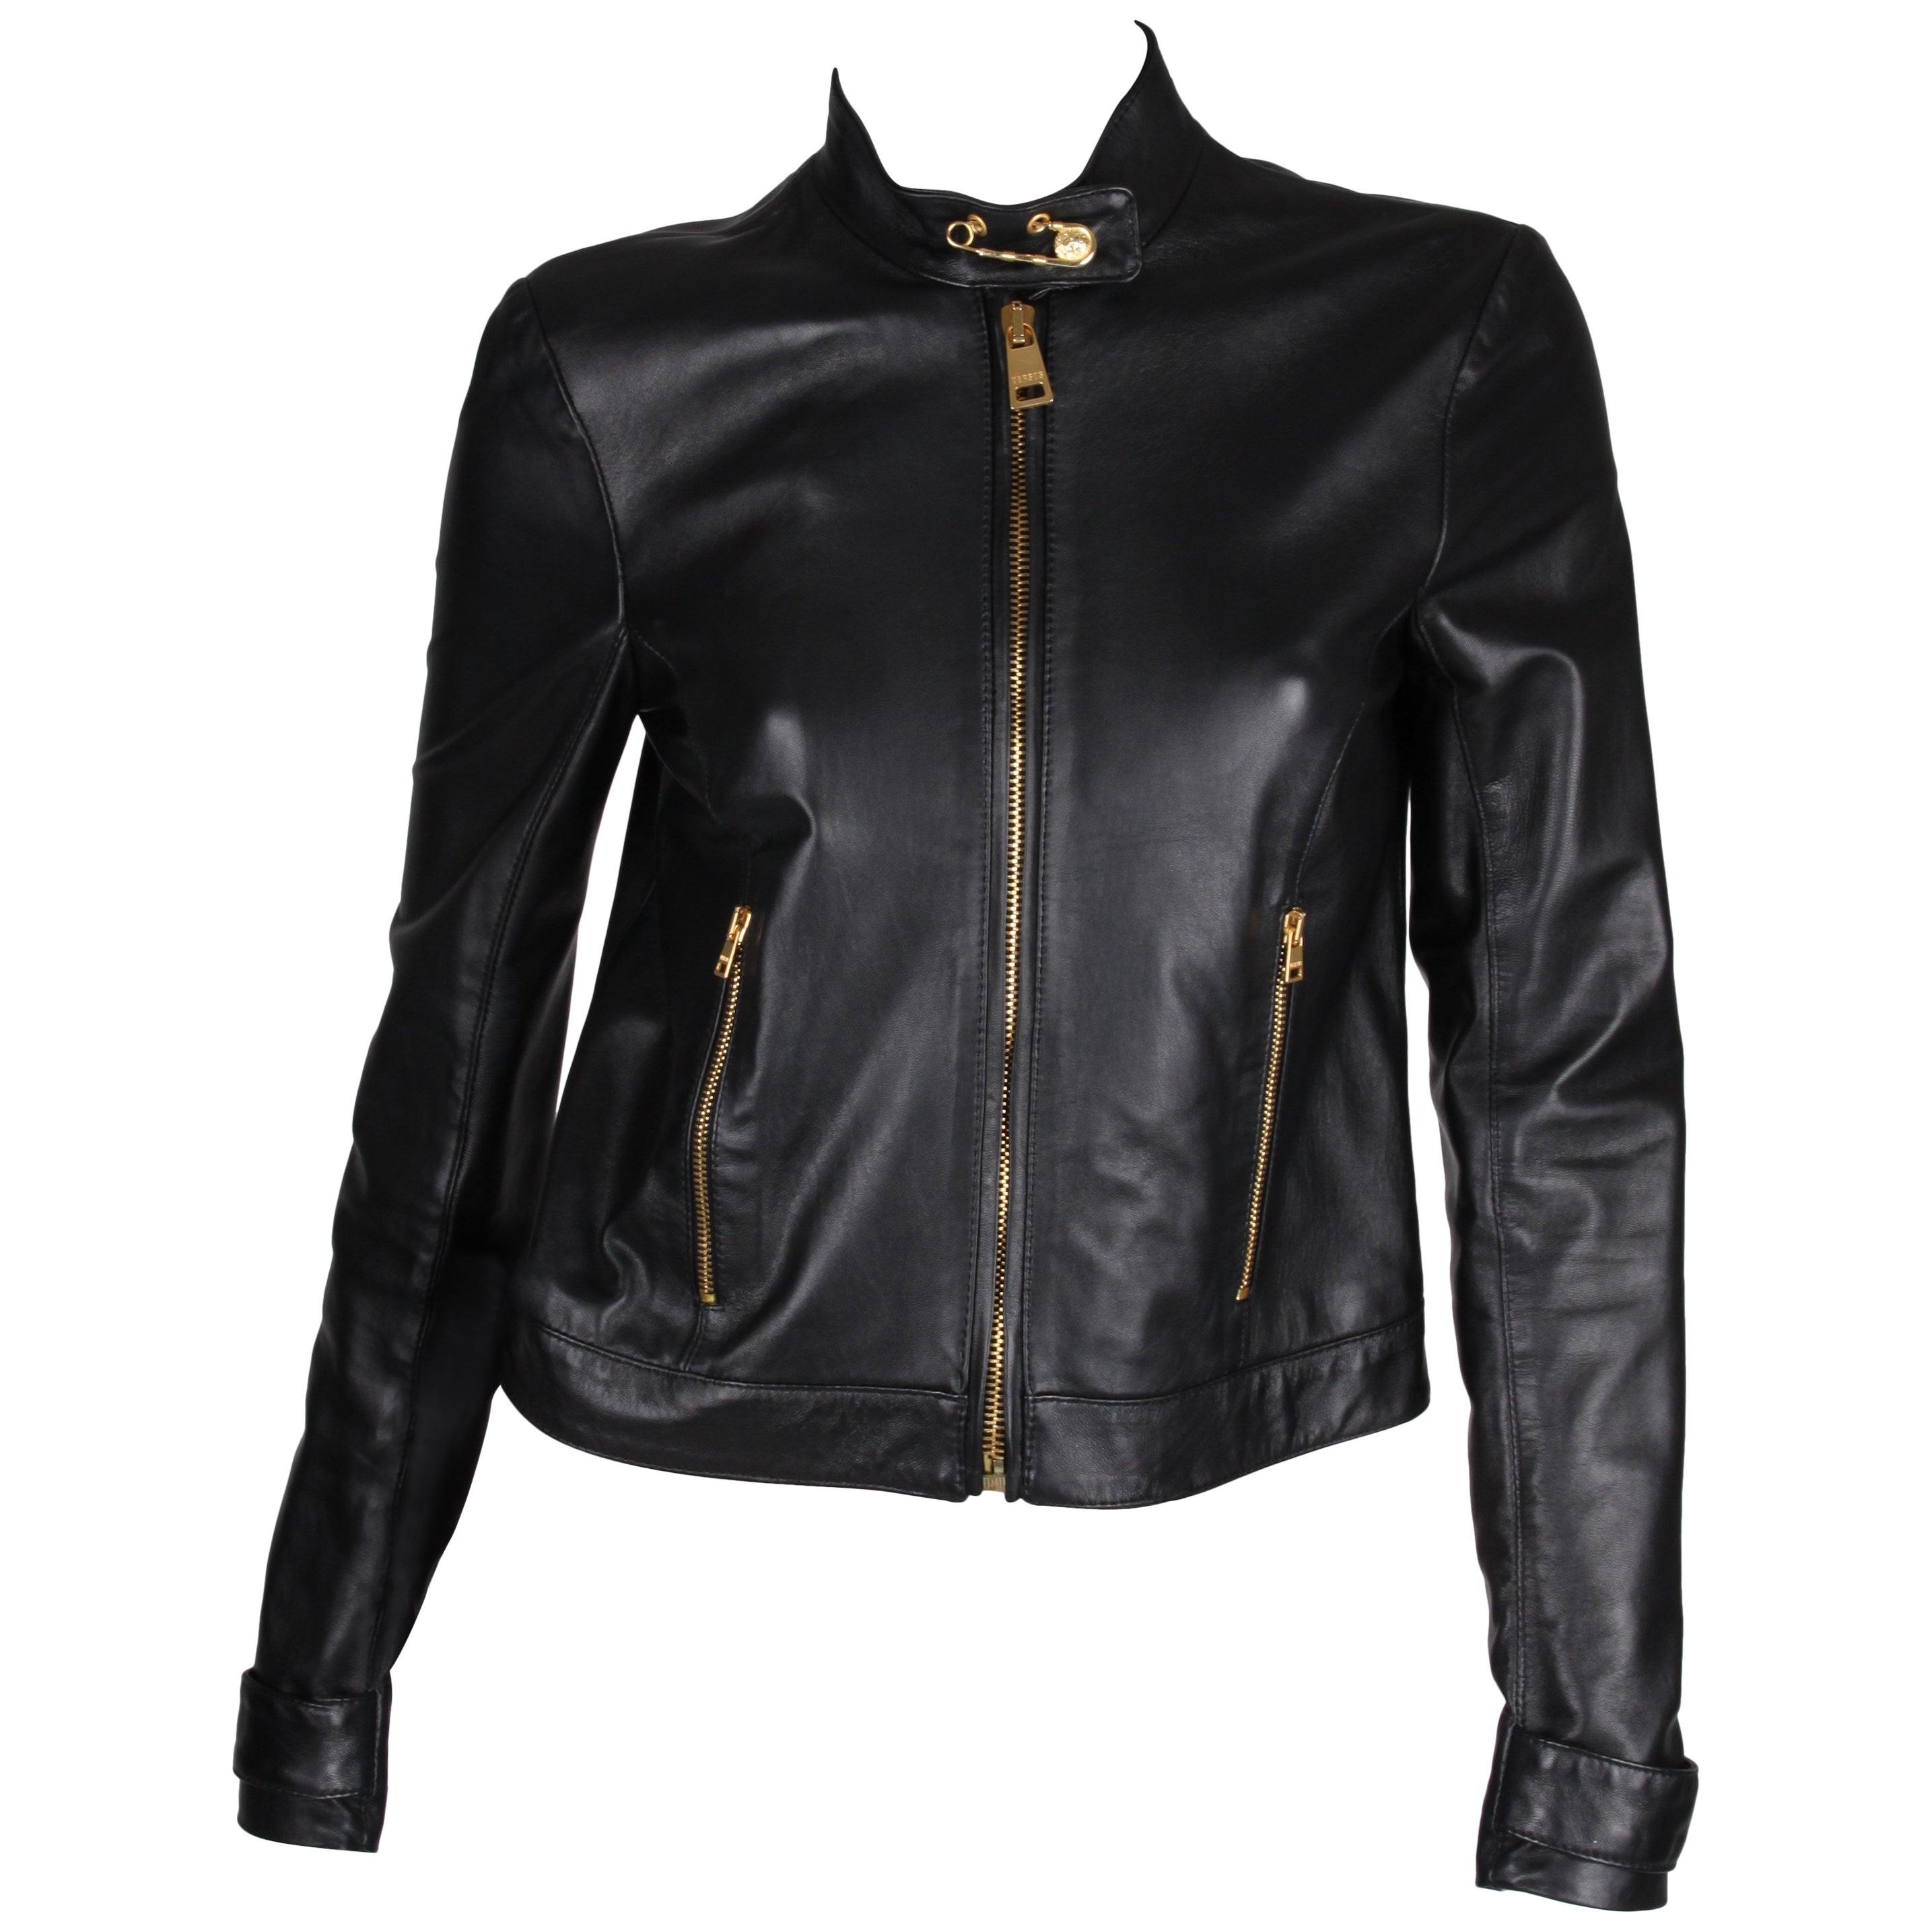 07ba689078ba Versus Versace Leather Jacket - black at 1stdibs